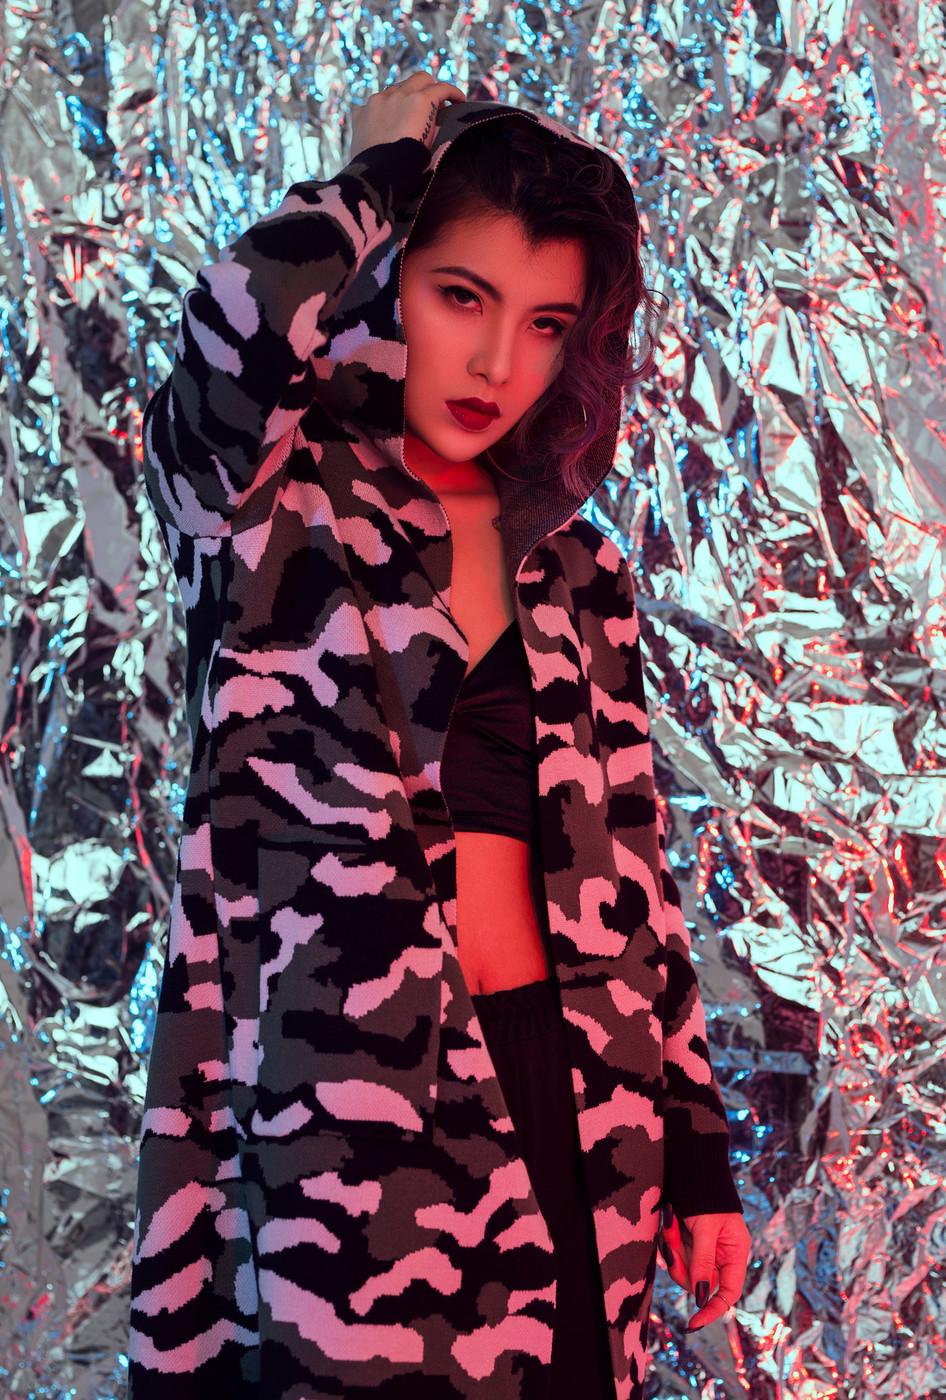 Cool girl【形象拍摄】25